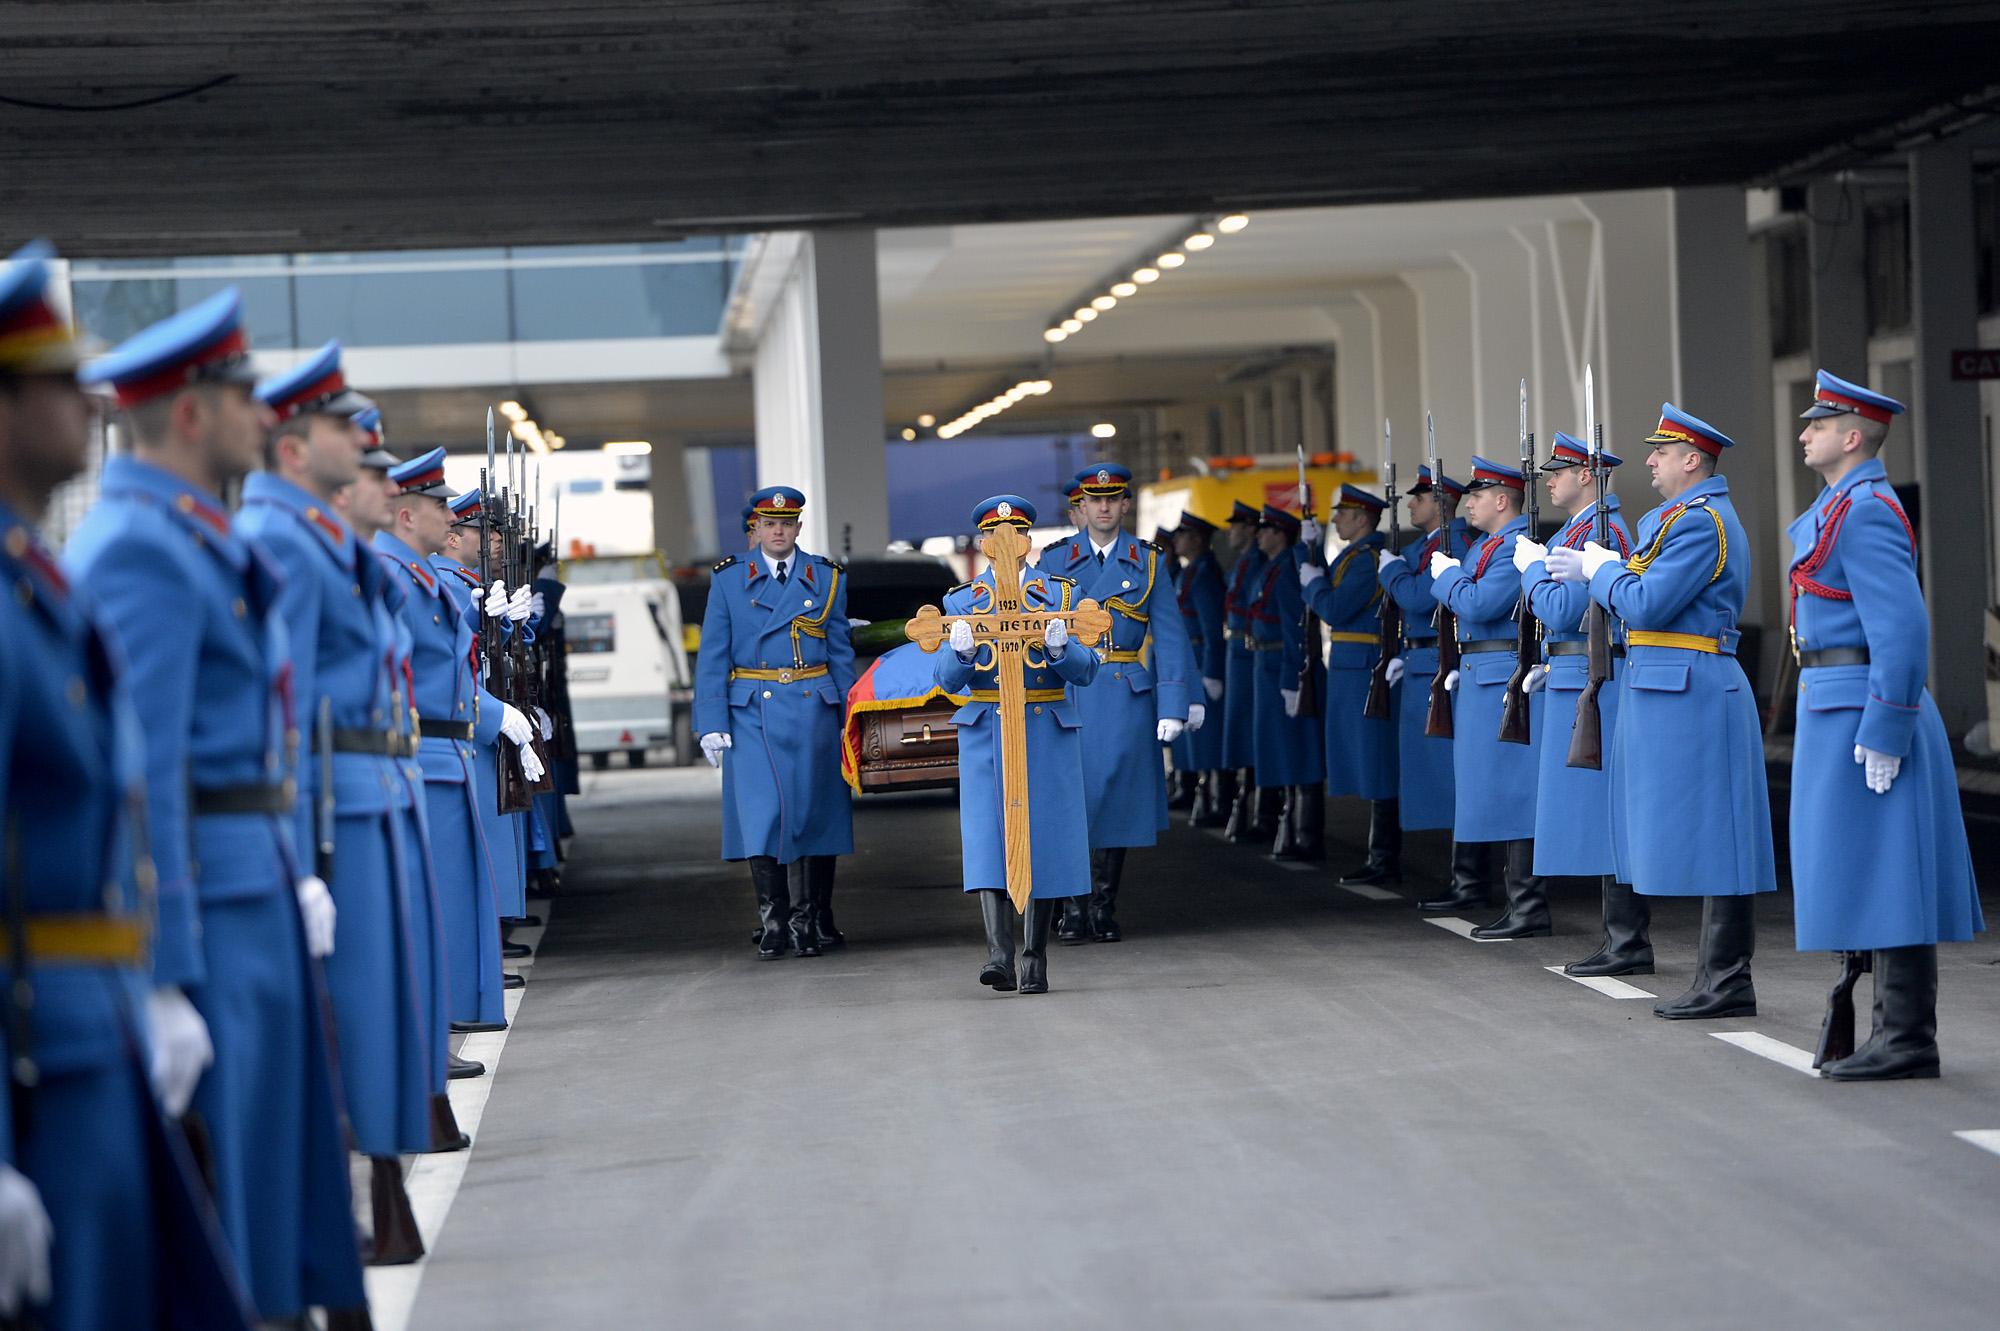 H στρατιωτική φρουρά υποδέχεται τον βασιλιά στο αεροδρόμιο του Βελιγραδίου